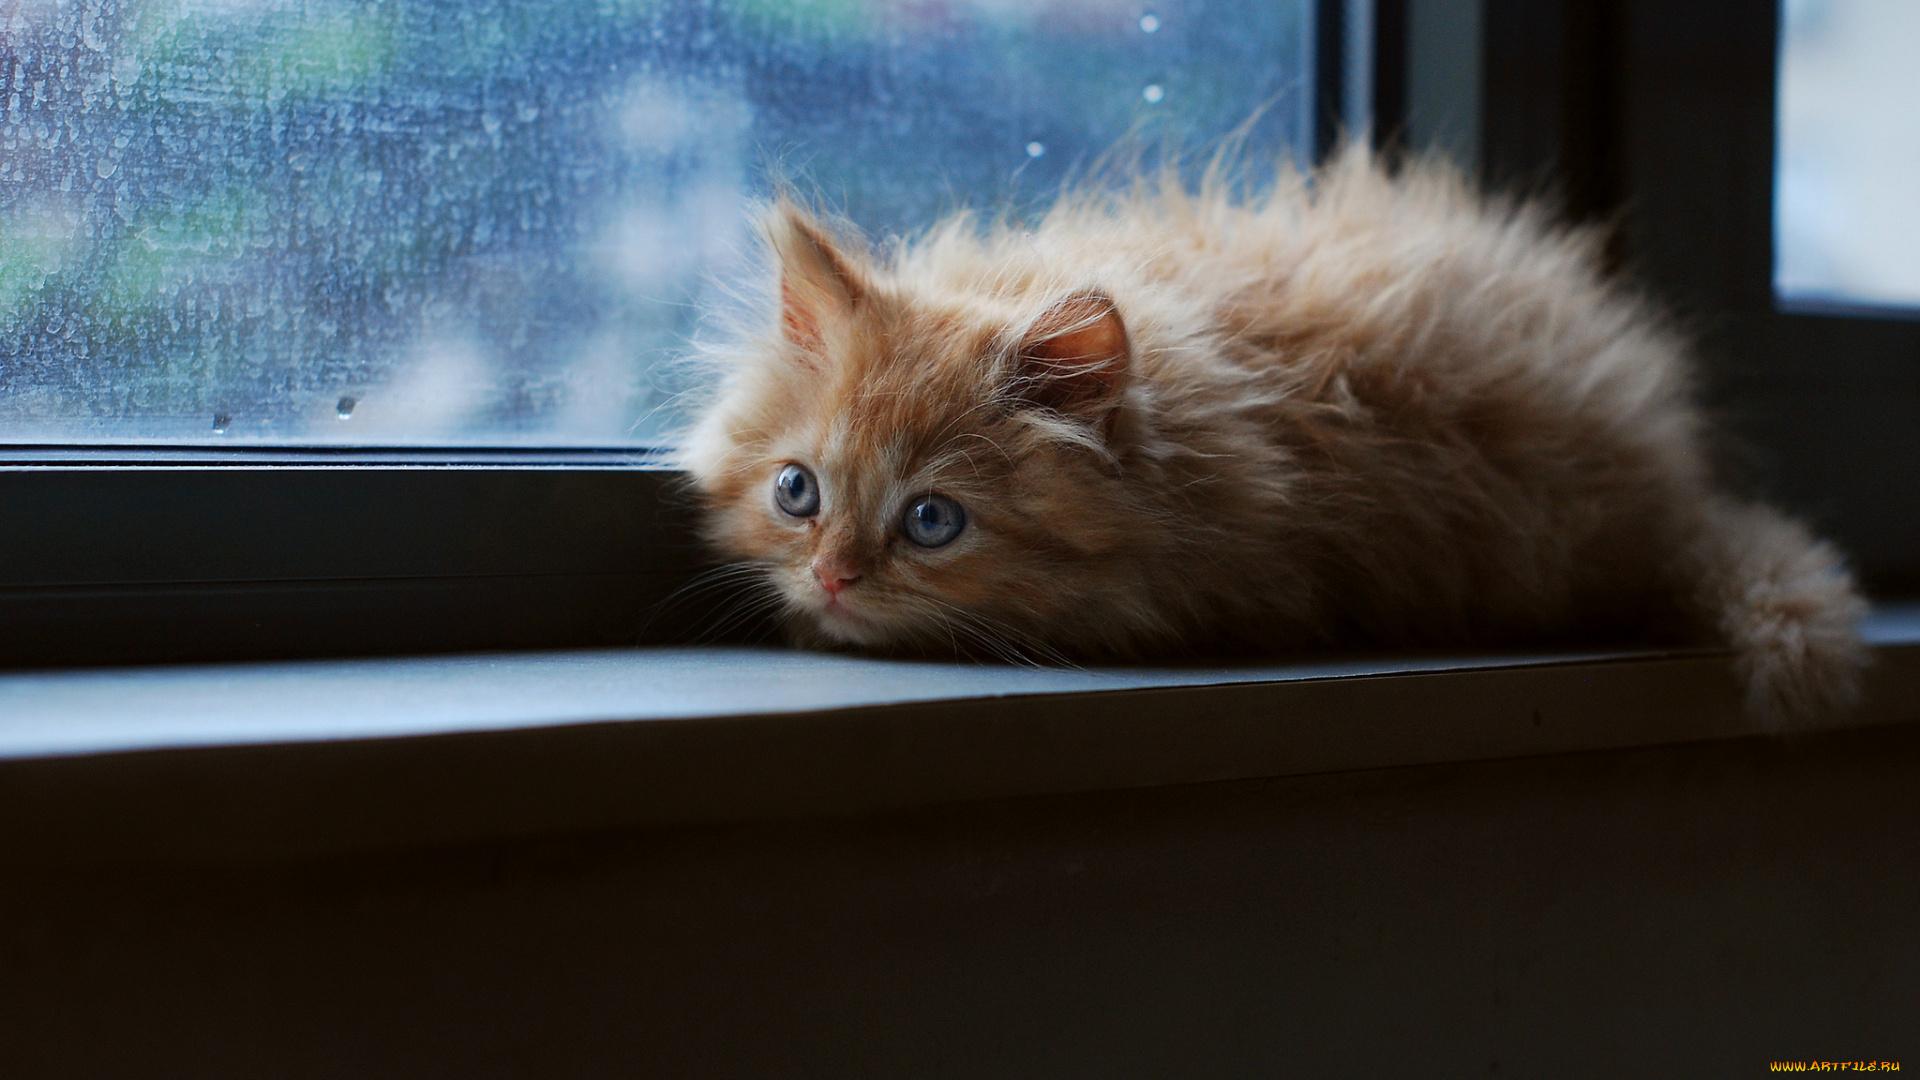 котята на окне kittens on the window  № 3063242 бесплатно